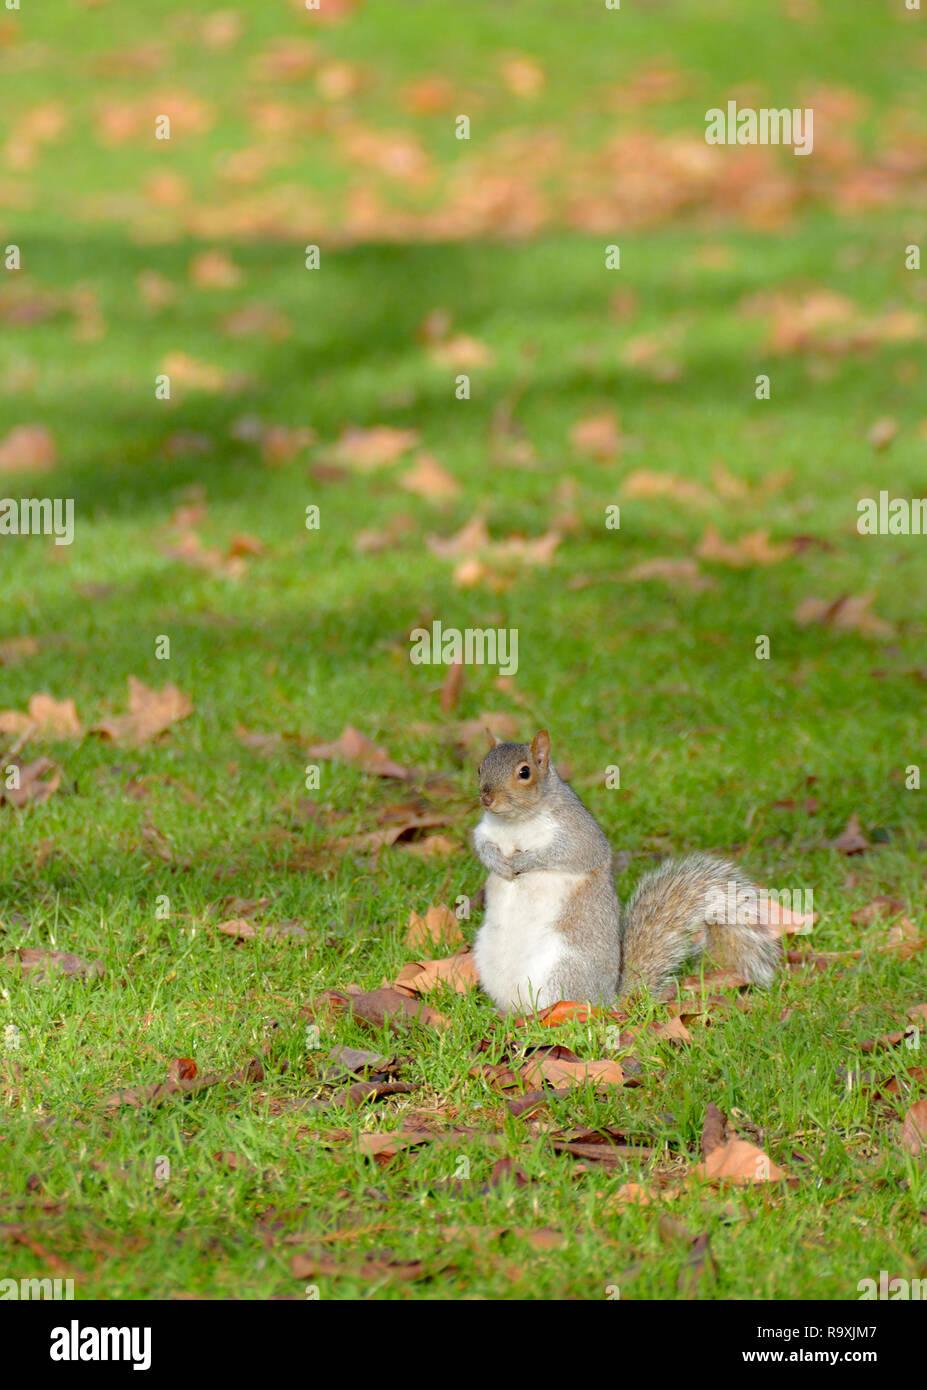 Grey Squirrel (Eastern Grey Squirrel / Gray Squirrel) Sciurus carolinensis. UK, - Stock Image